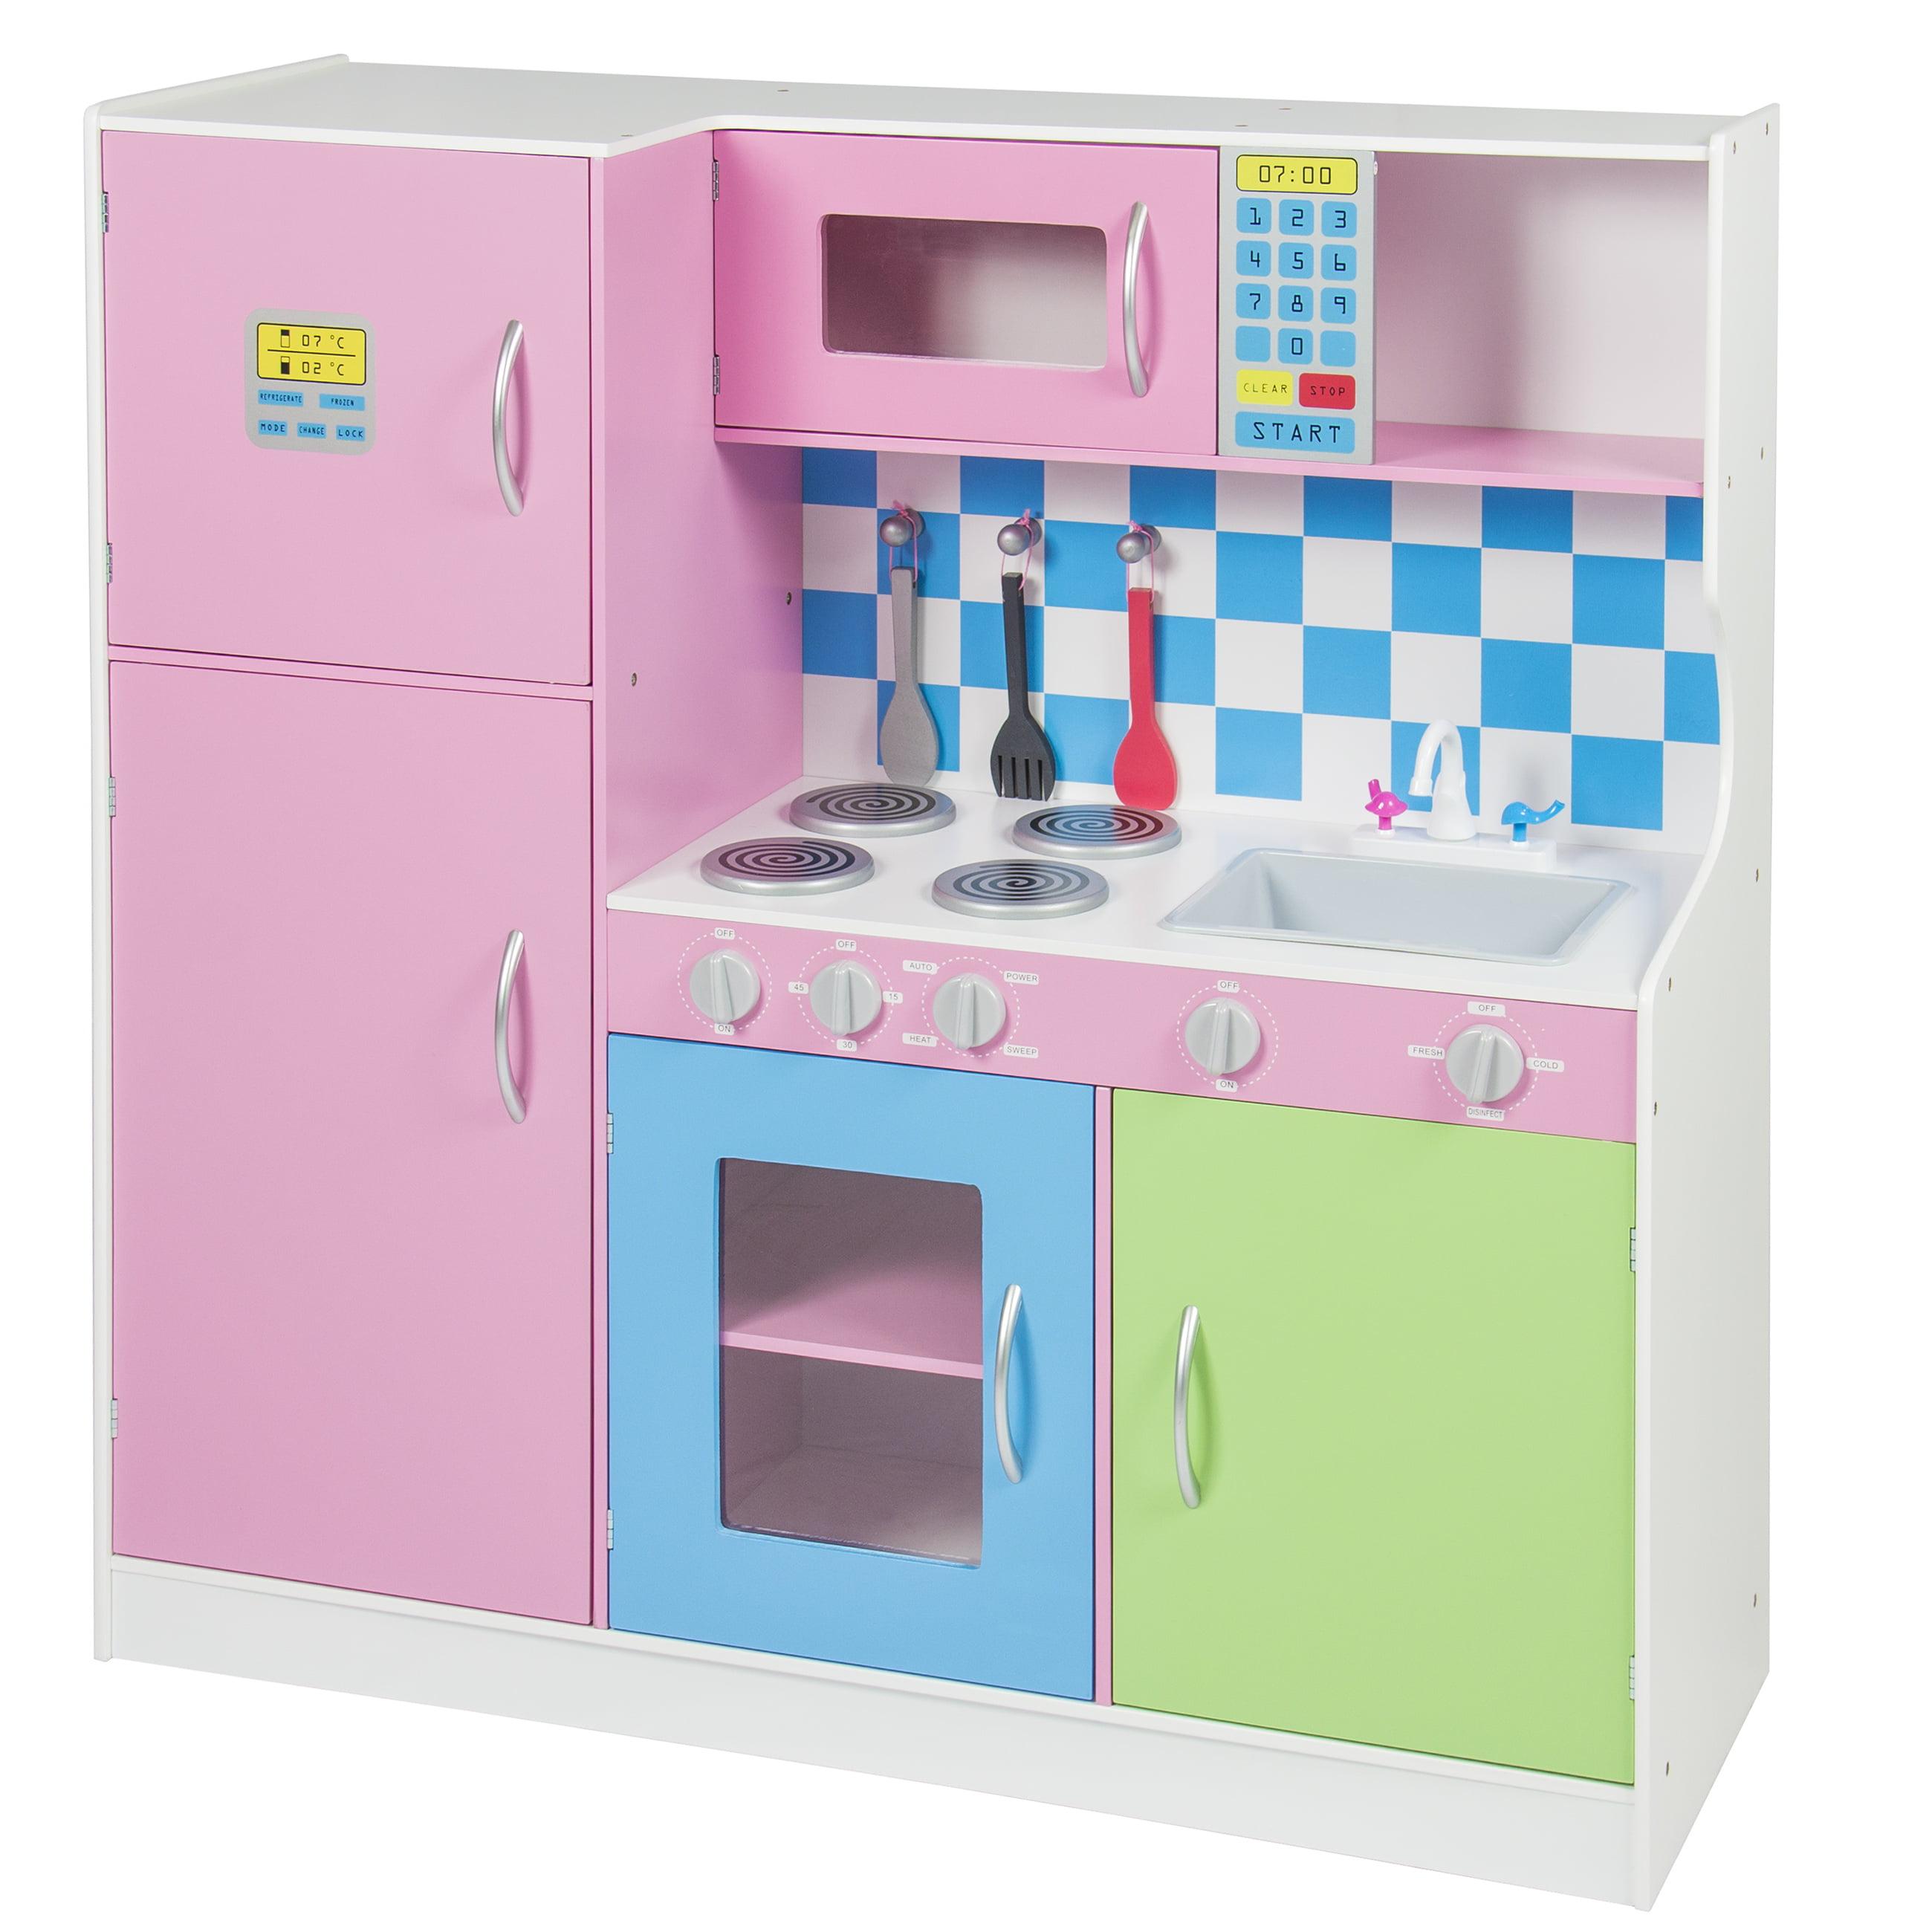 Best Choice Products Wooden Pretend Kitchen Playset W